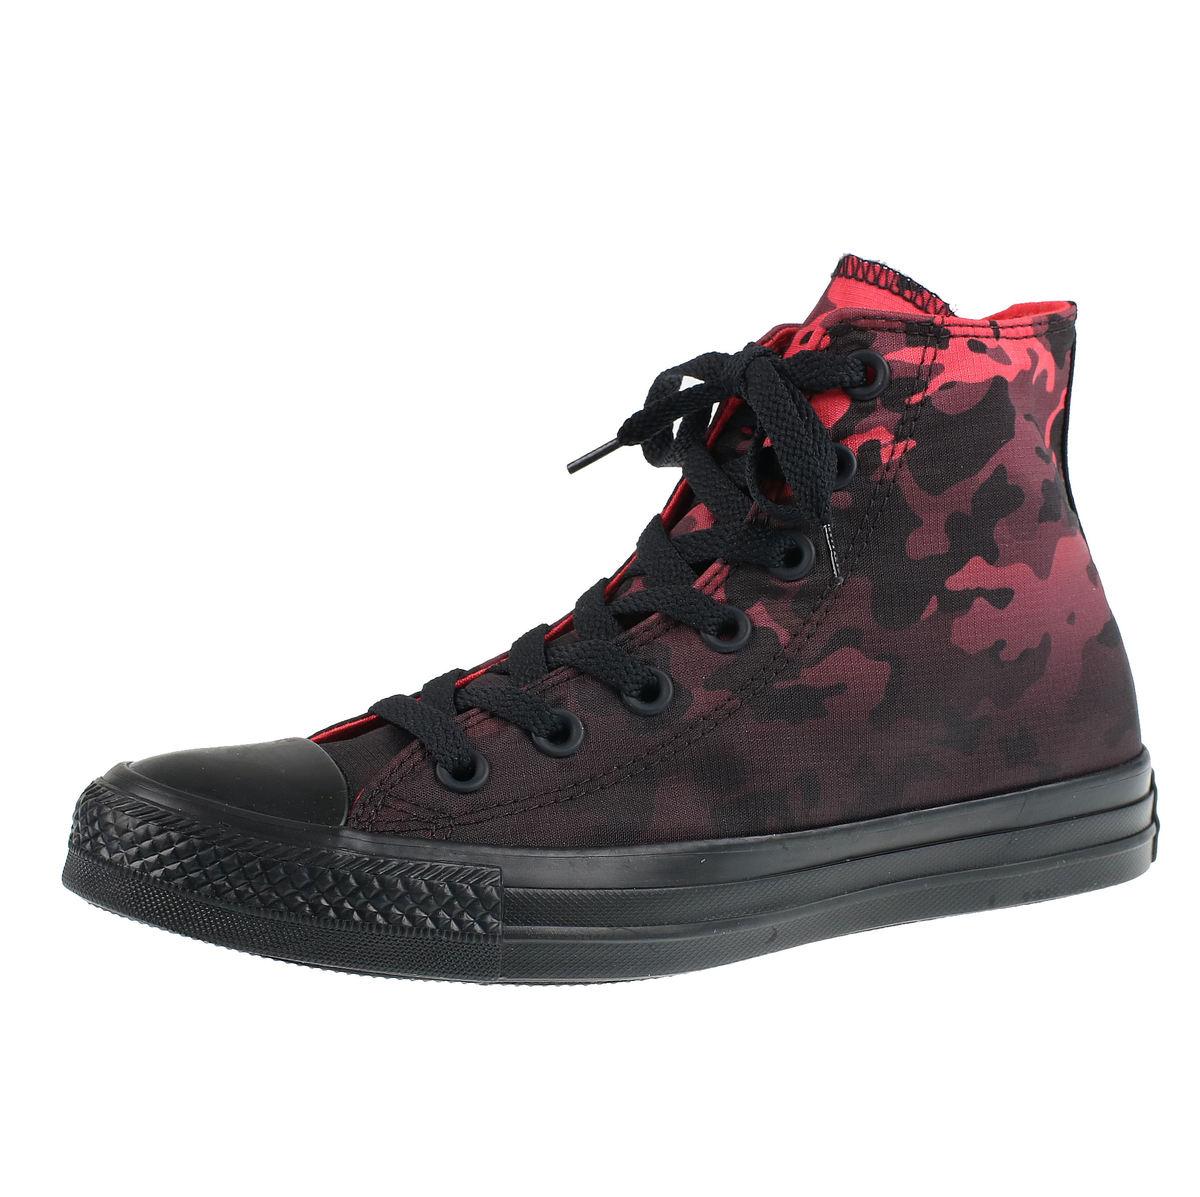 ce81aa81c638 topánky CONVERSE - CTAS HI SEDONA - RED   BLACK - 163242C - metalshop.sk